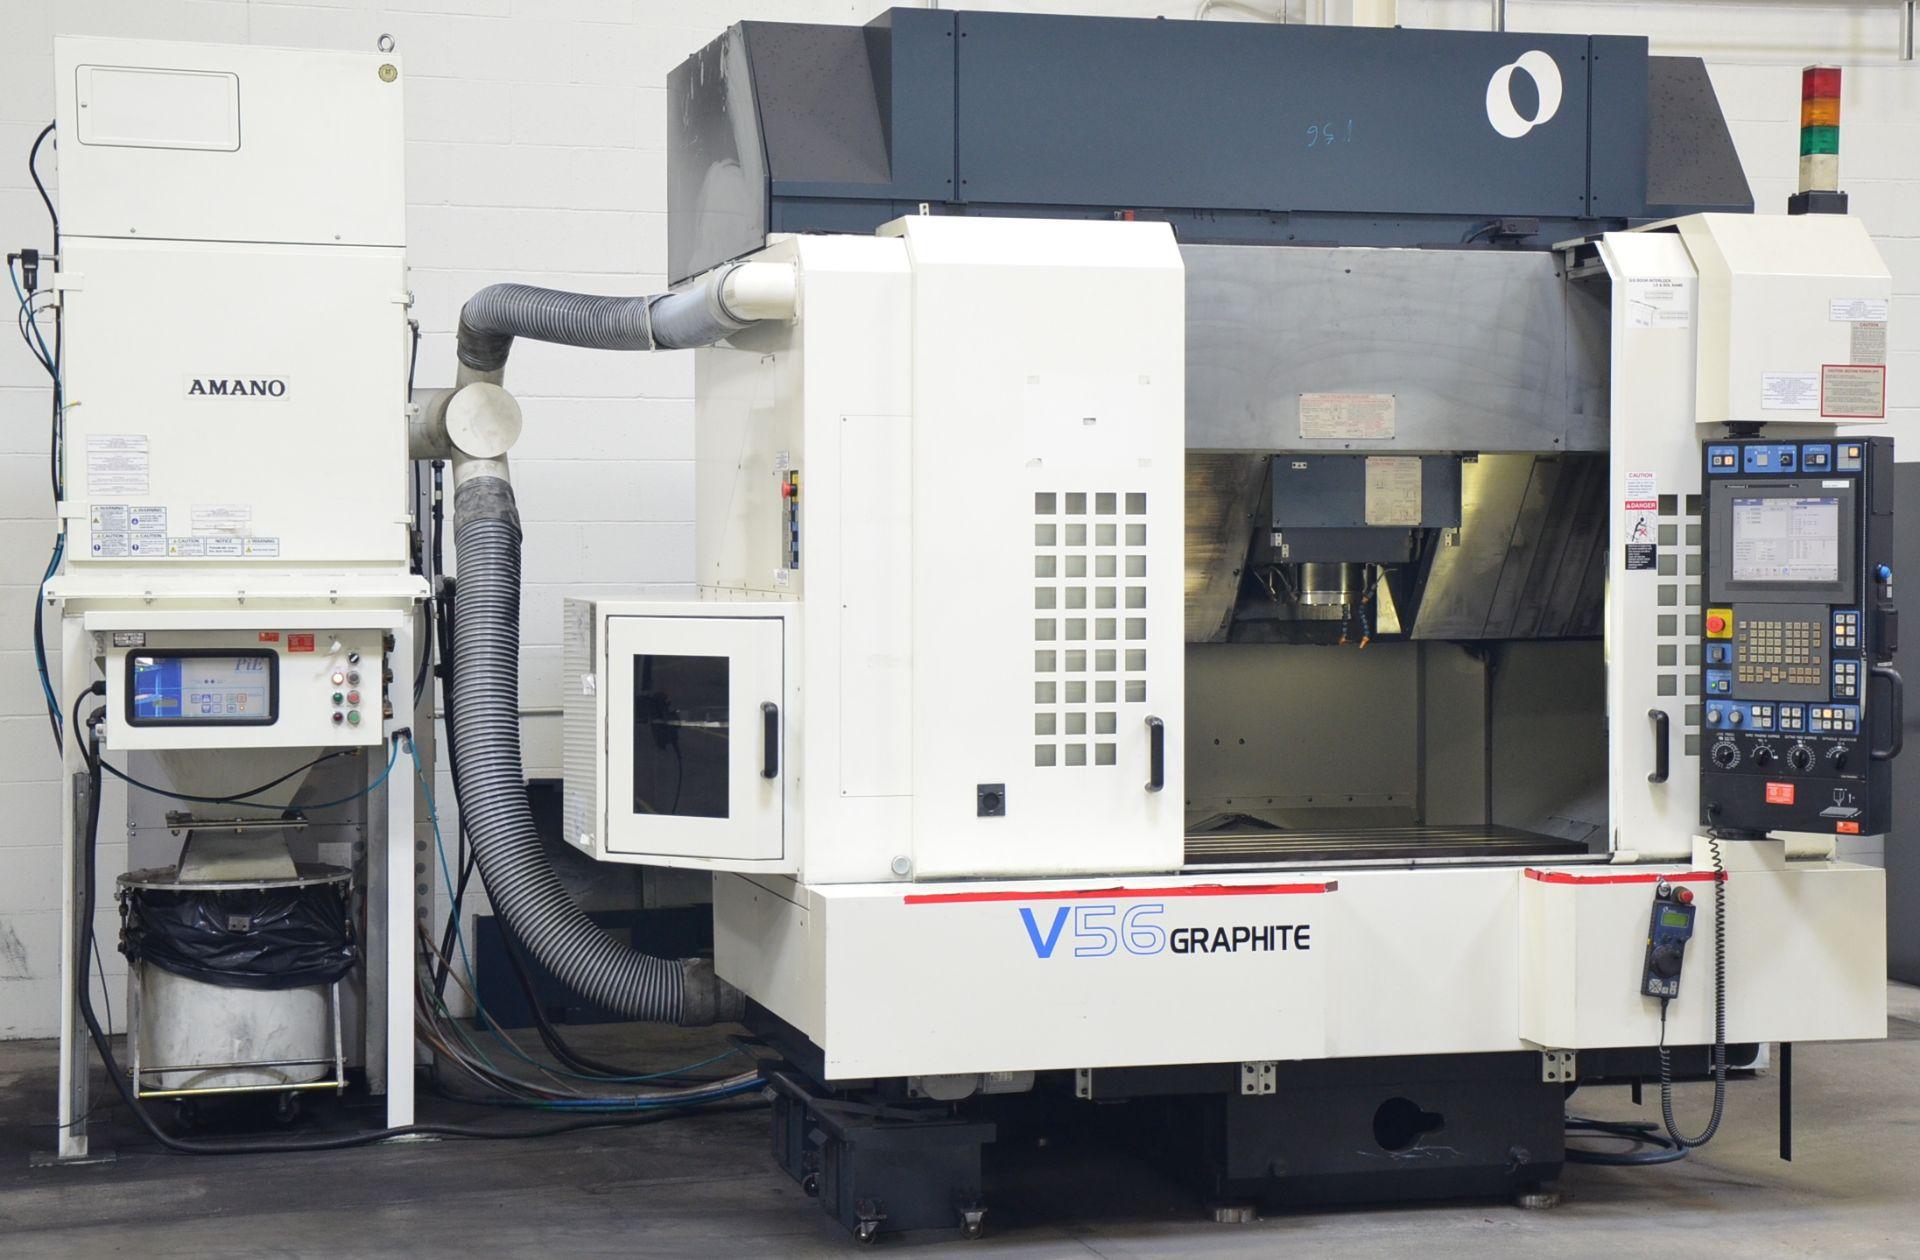 MAKINO (2008) V56 GRAPHITE CNC VERTICAL MACHINING CENTER WITH MAKINO PROFESSIONAL 5 TOUCHSCREEN